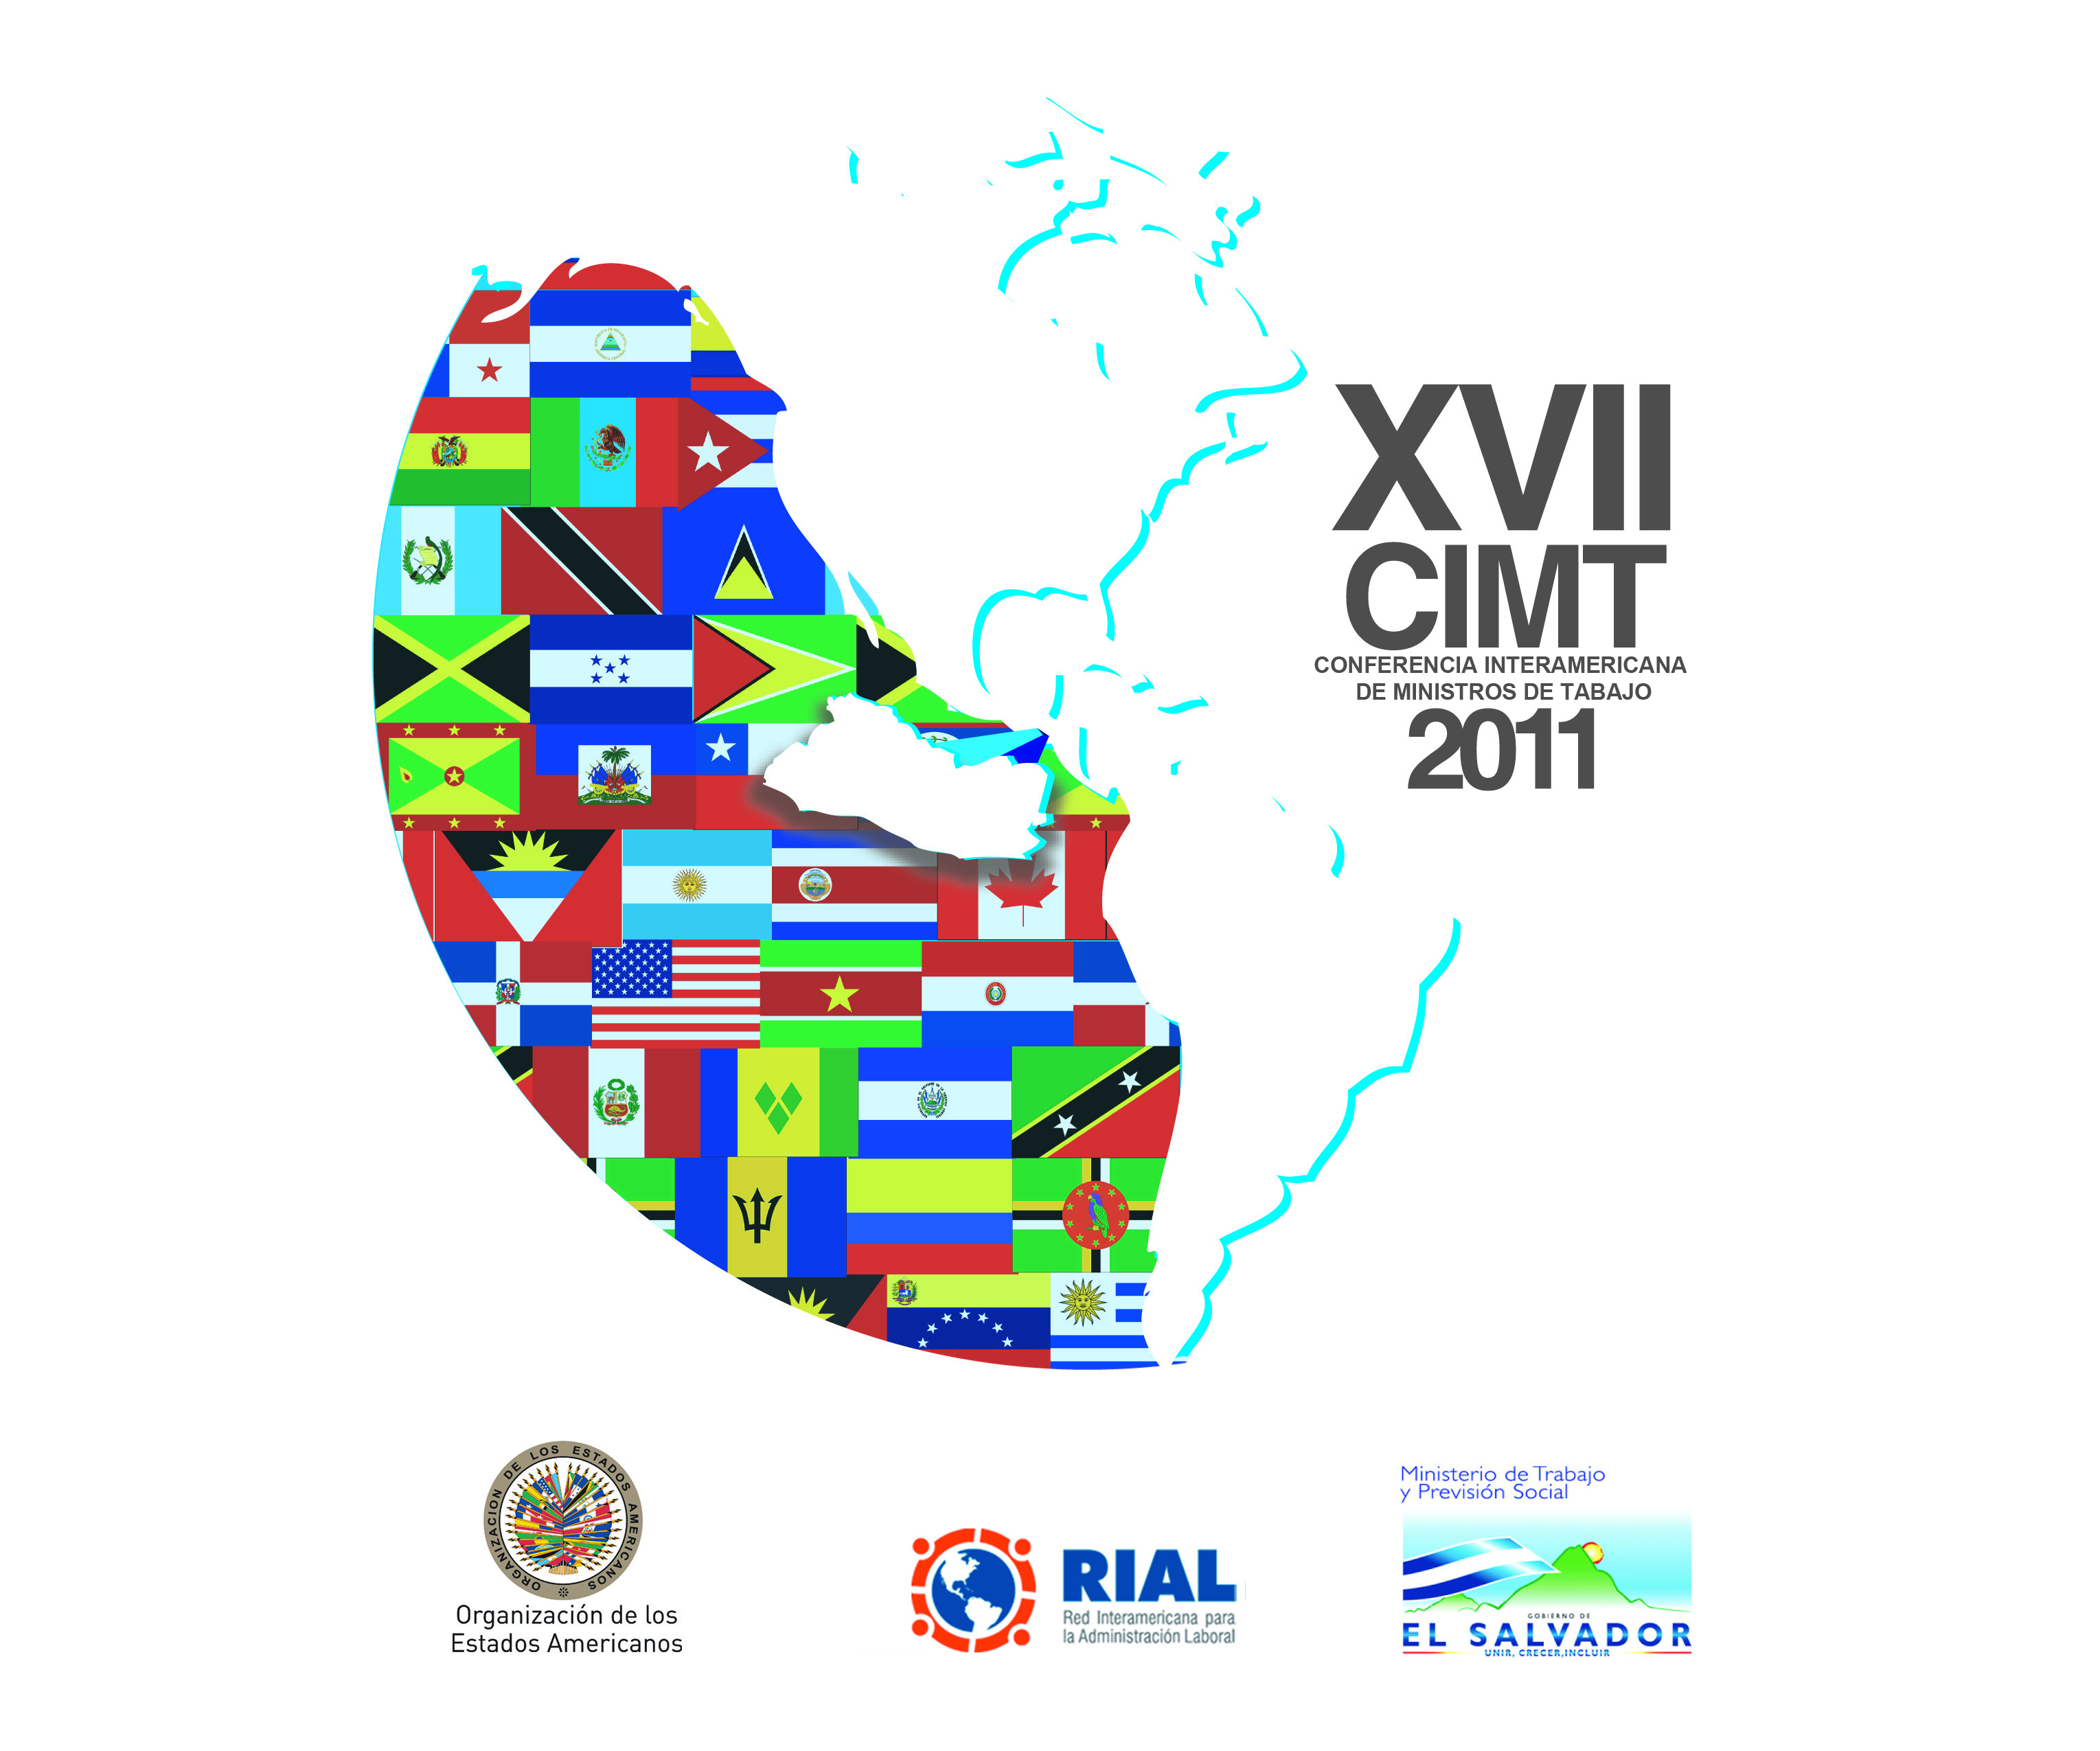 XVI CIMT - 2009